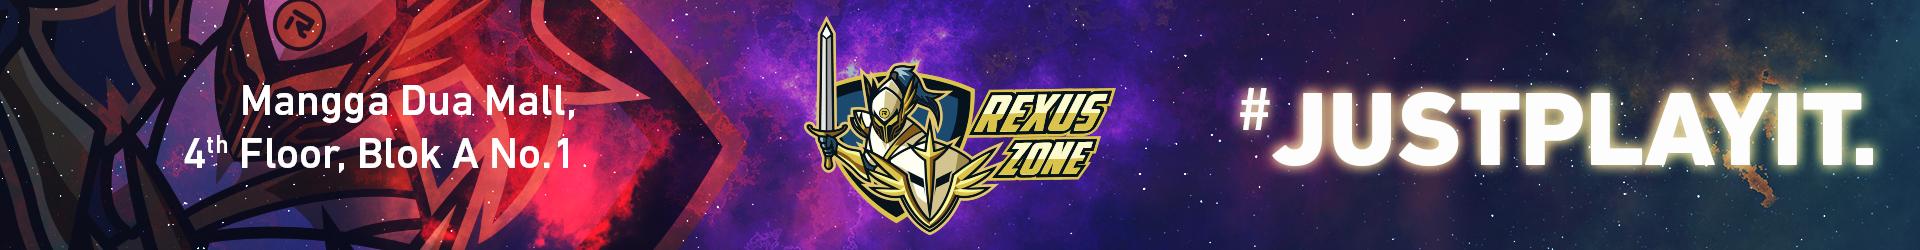 Rexus zone